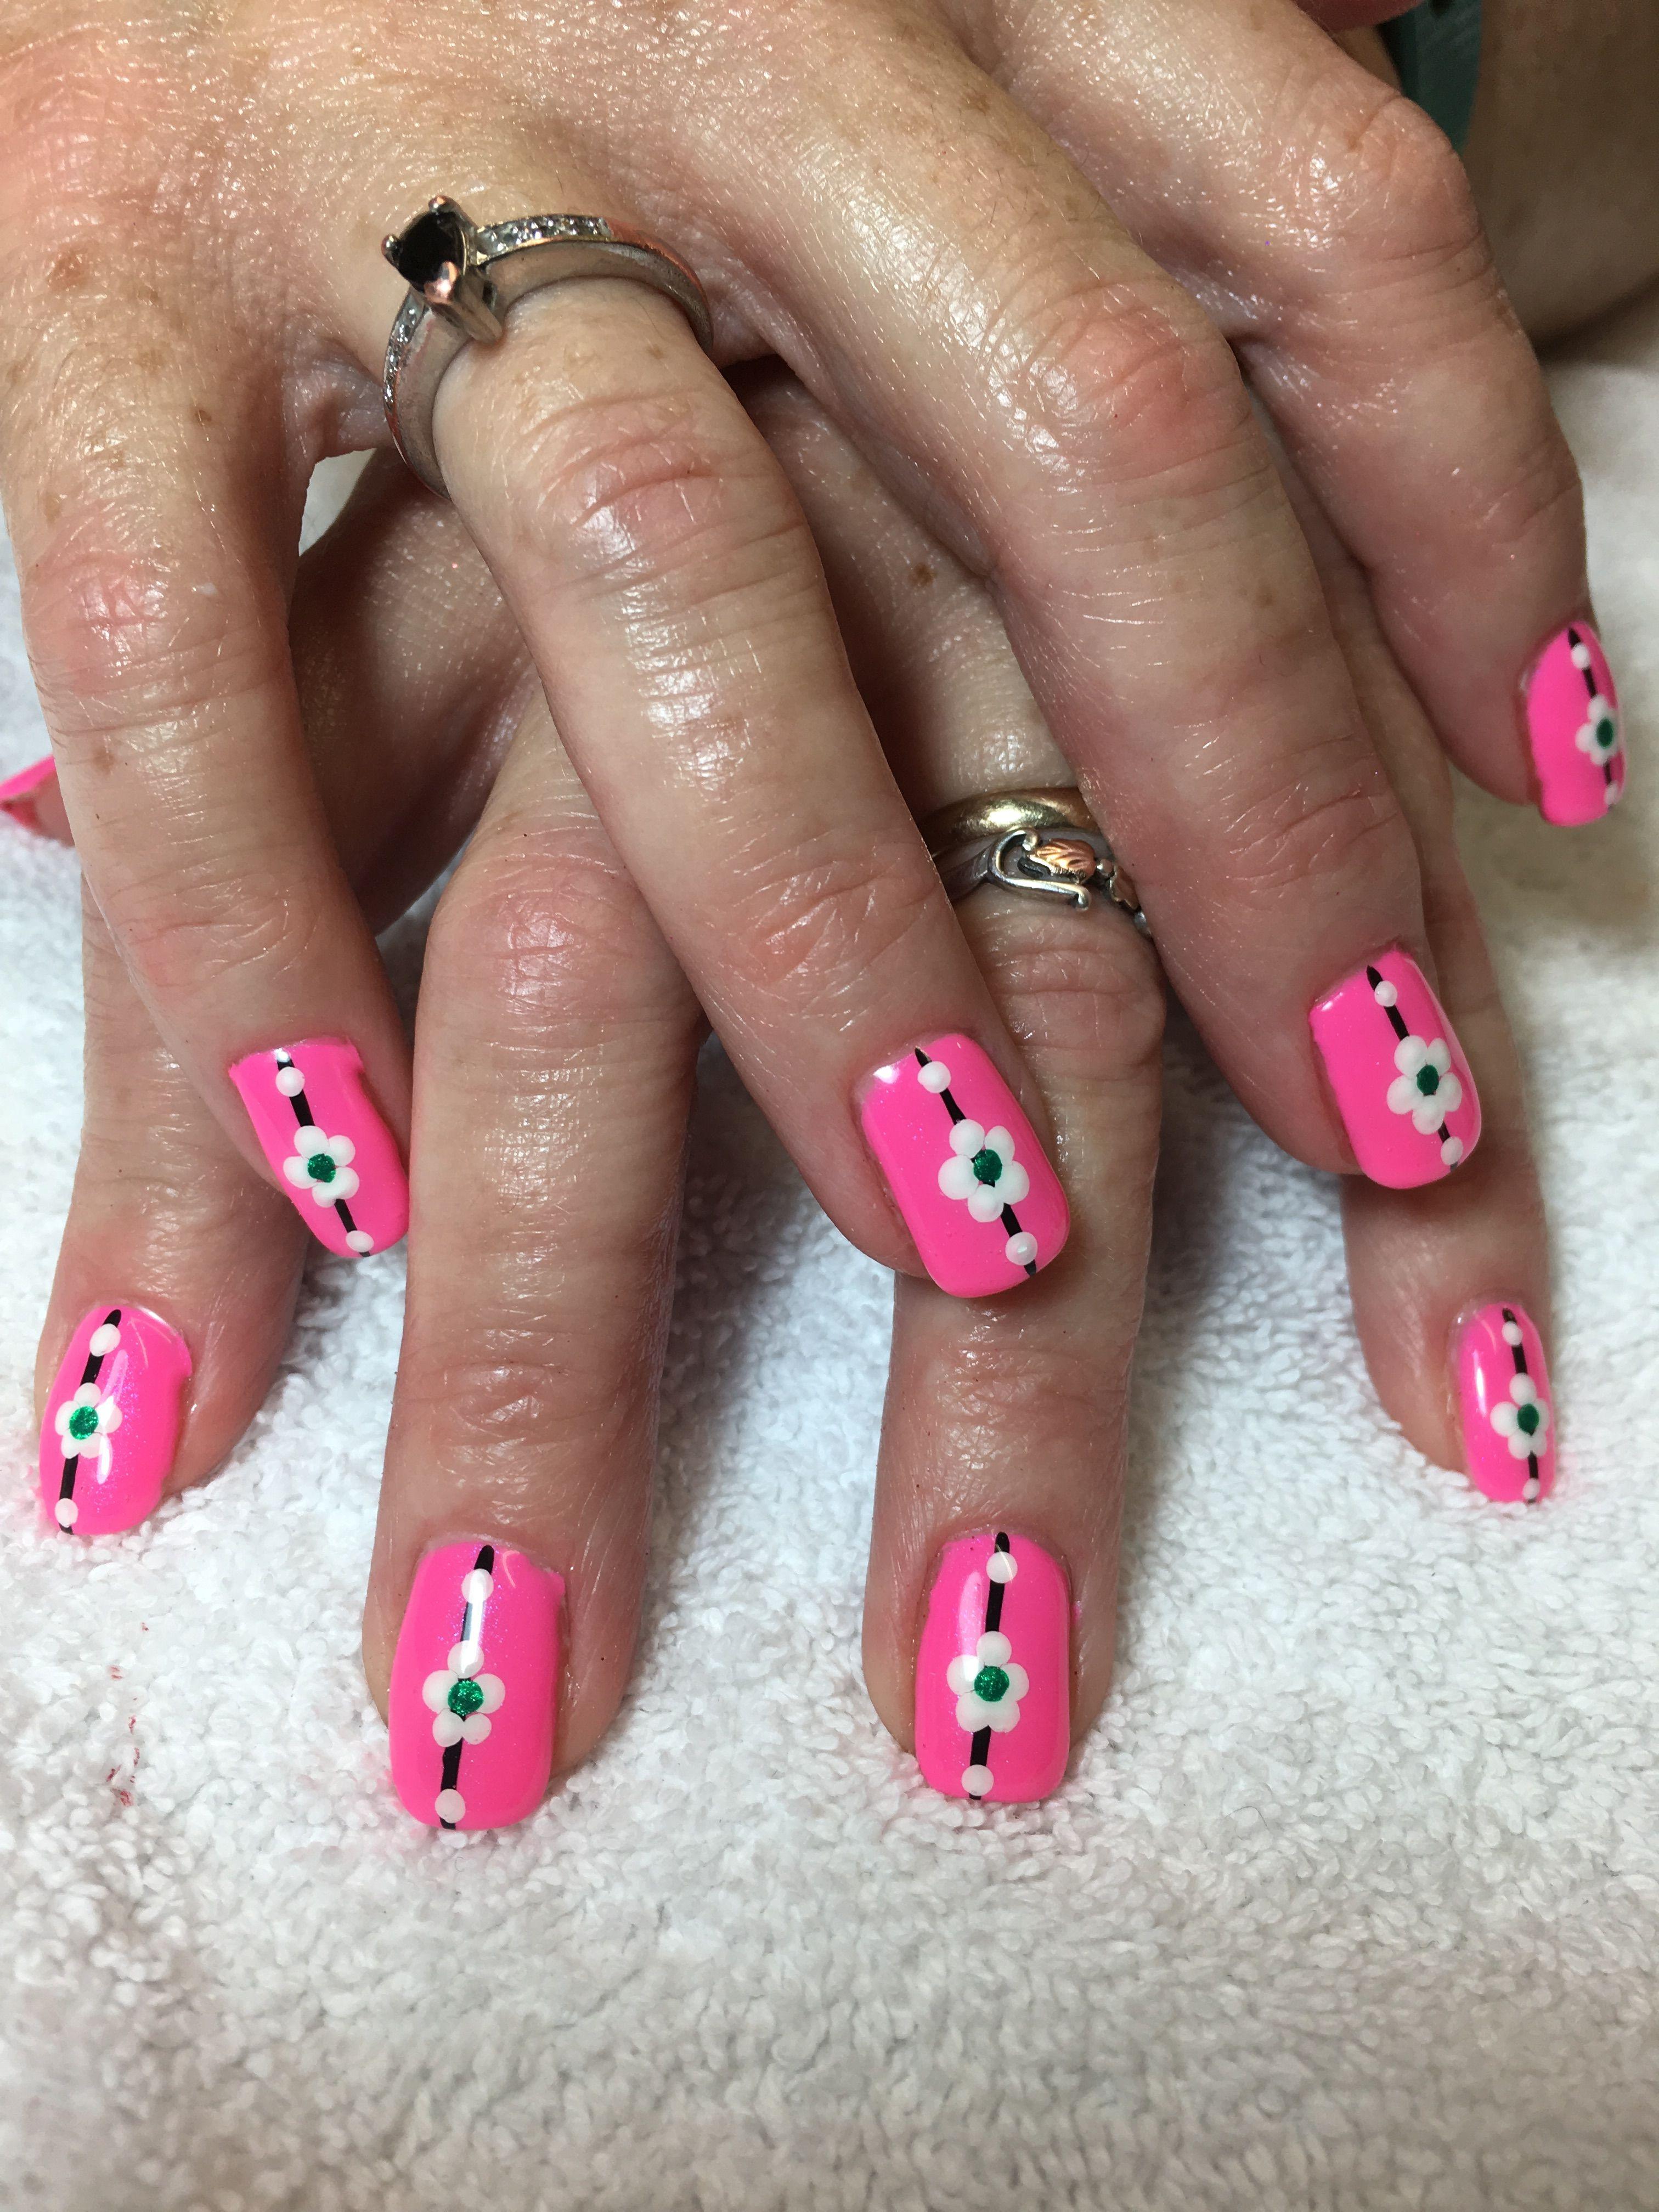 Simple flower nail design | Cheryls nail designs | Pinterest ...